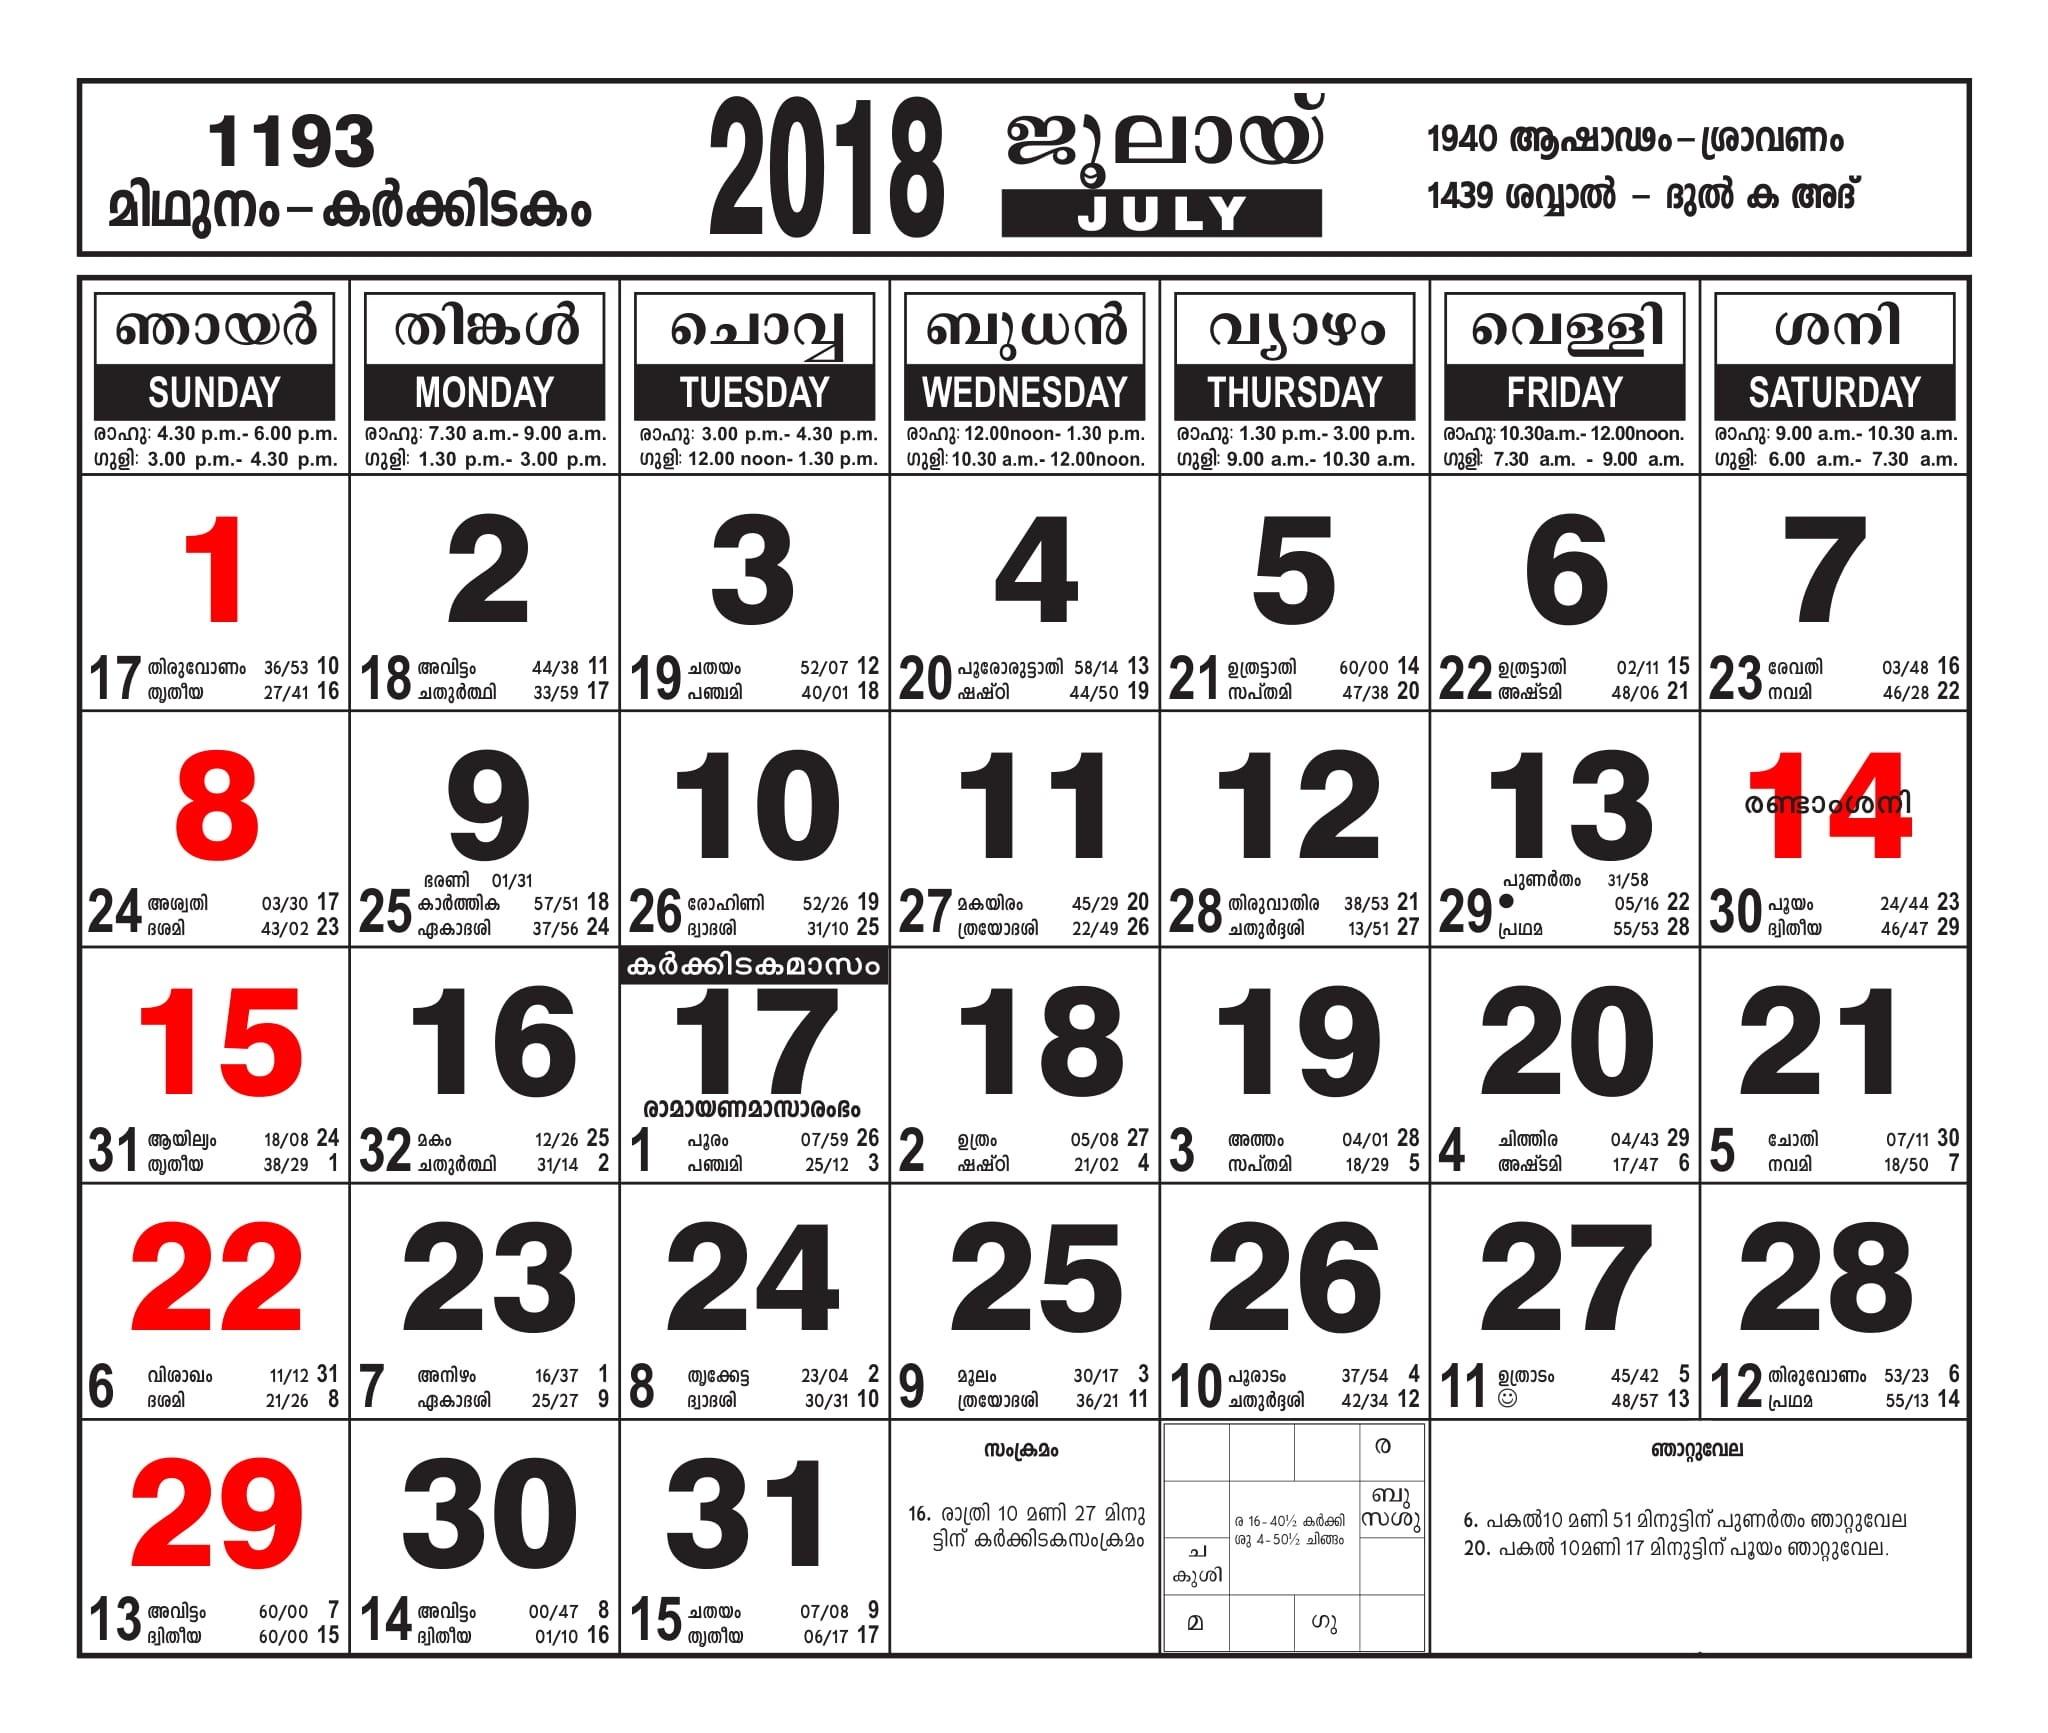 Kerala Govt Calendar August 2020 | Example Calendar Printable in Kerala Govt Calendar